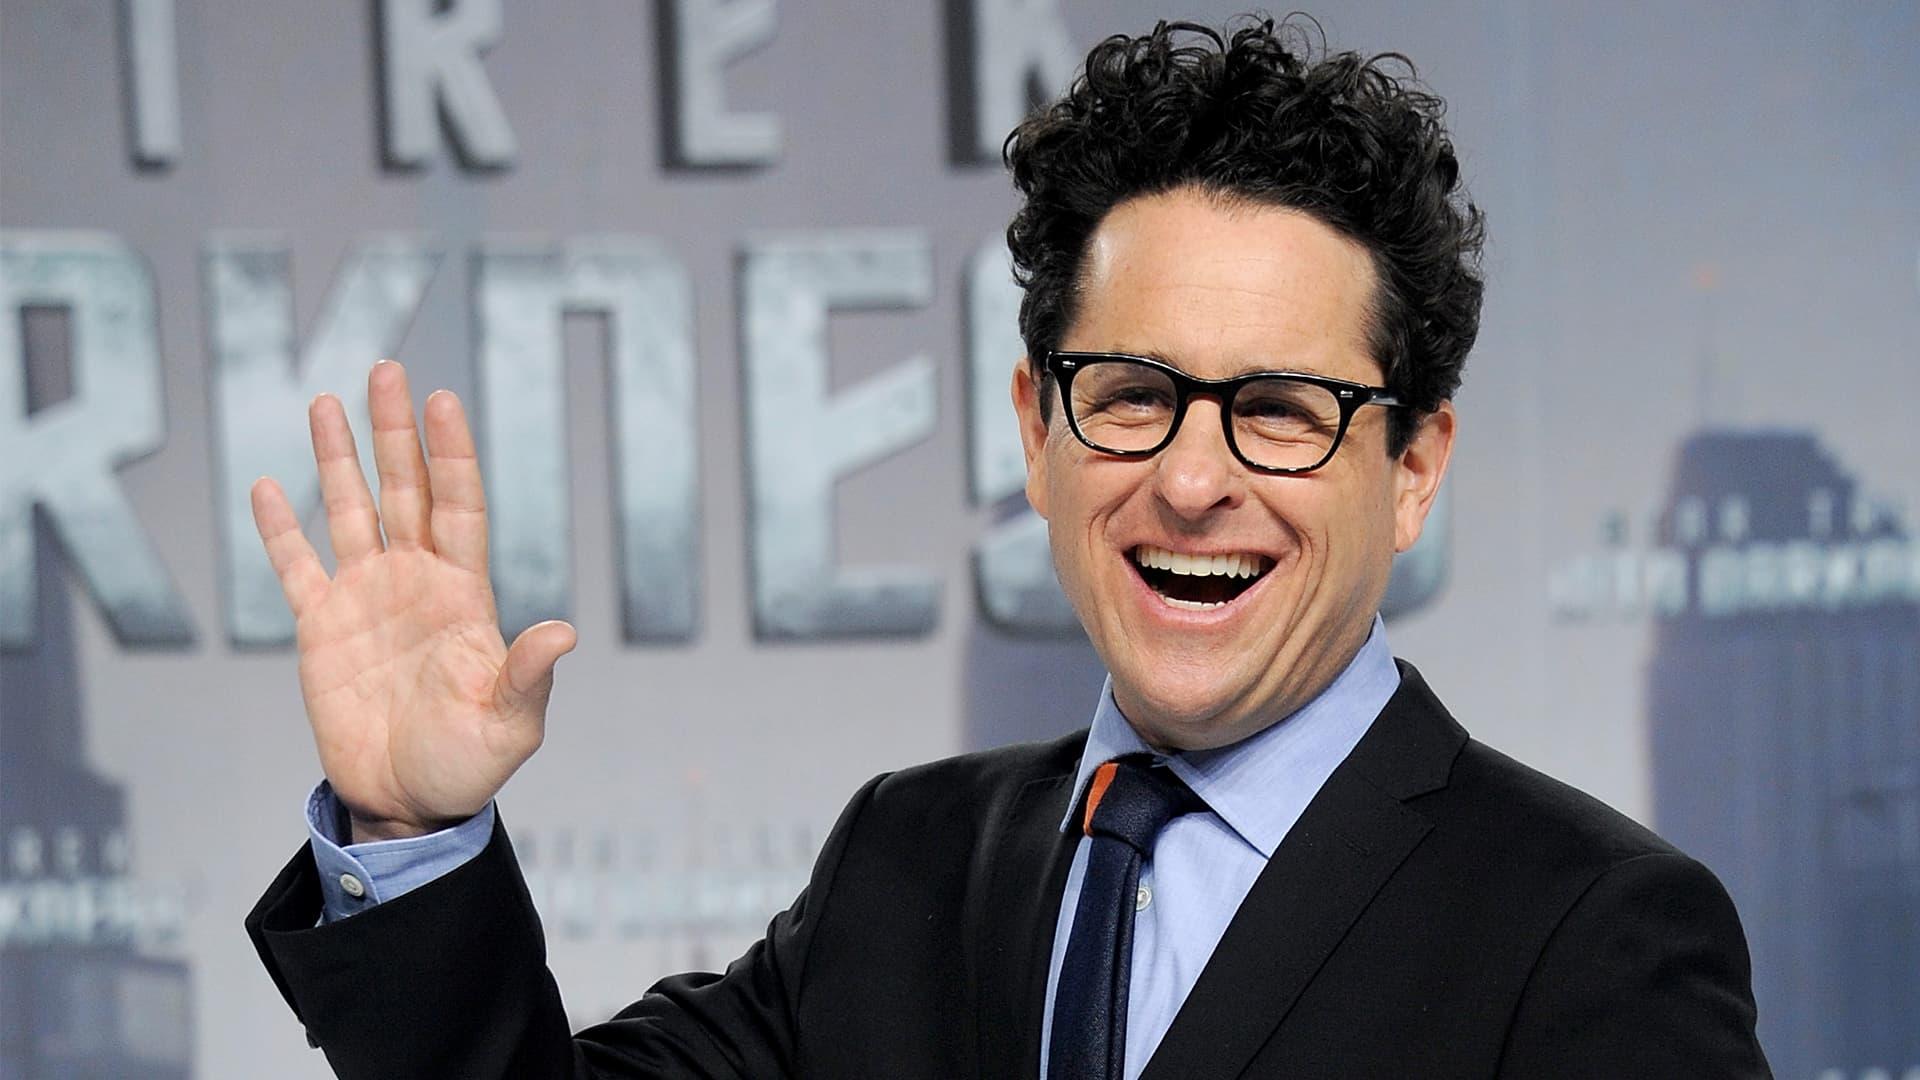 J.J. Abrams returns as director for Star Wars Episode XI